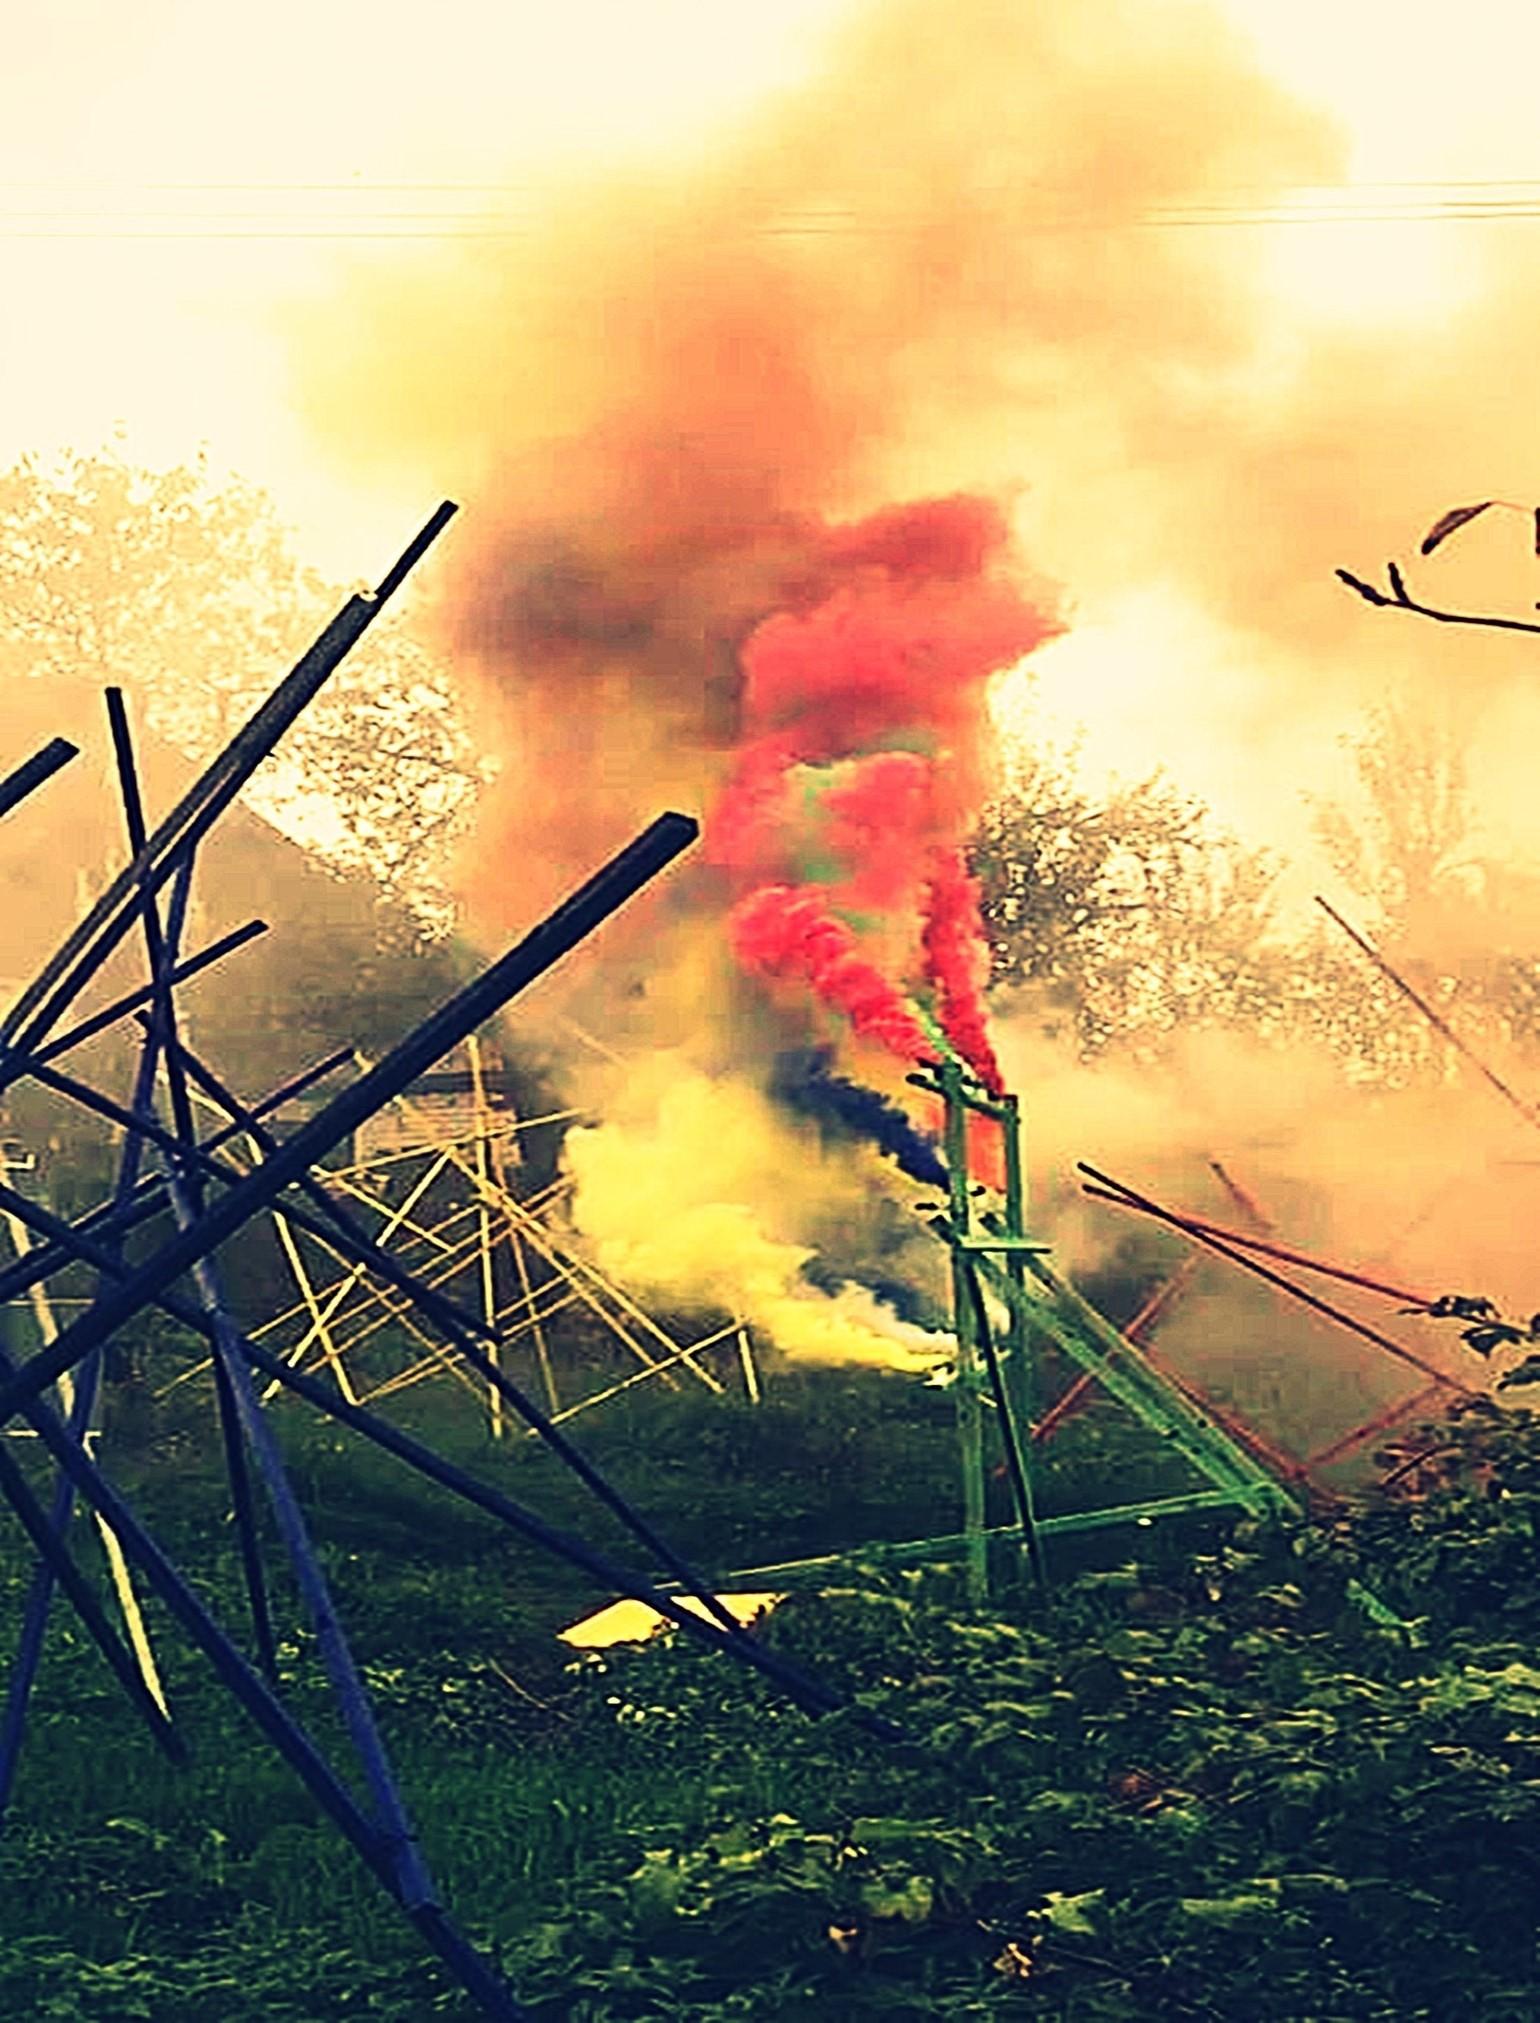 File:Pedro Meier Rauch Performance »Apocalypse Now« 2017, Color